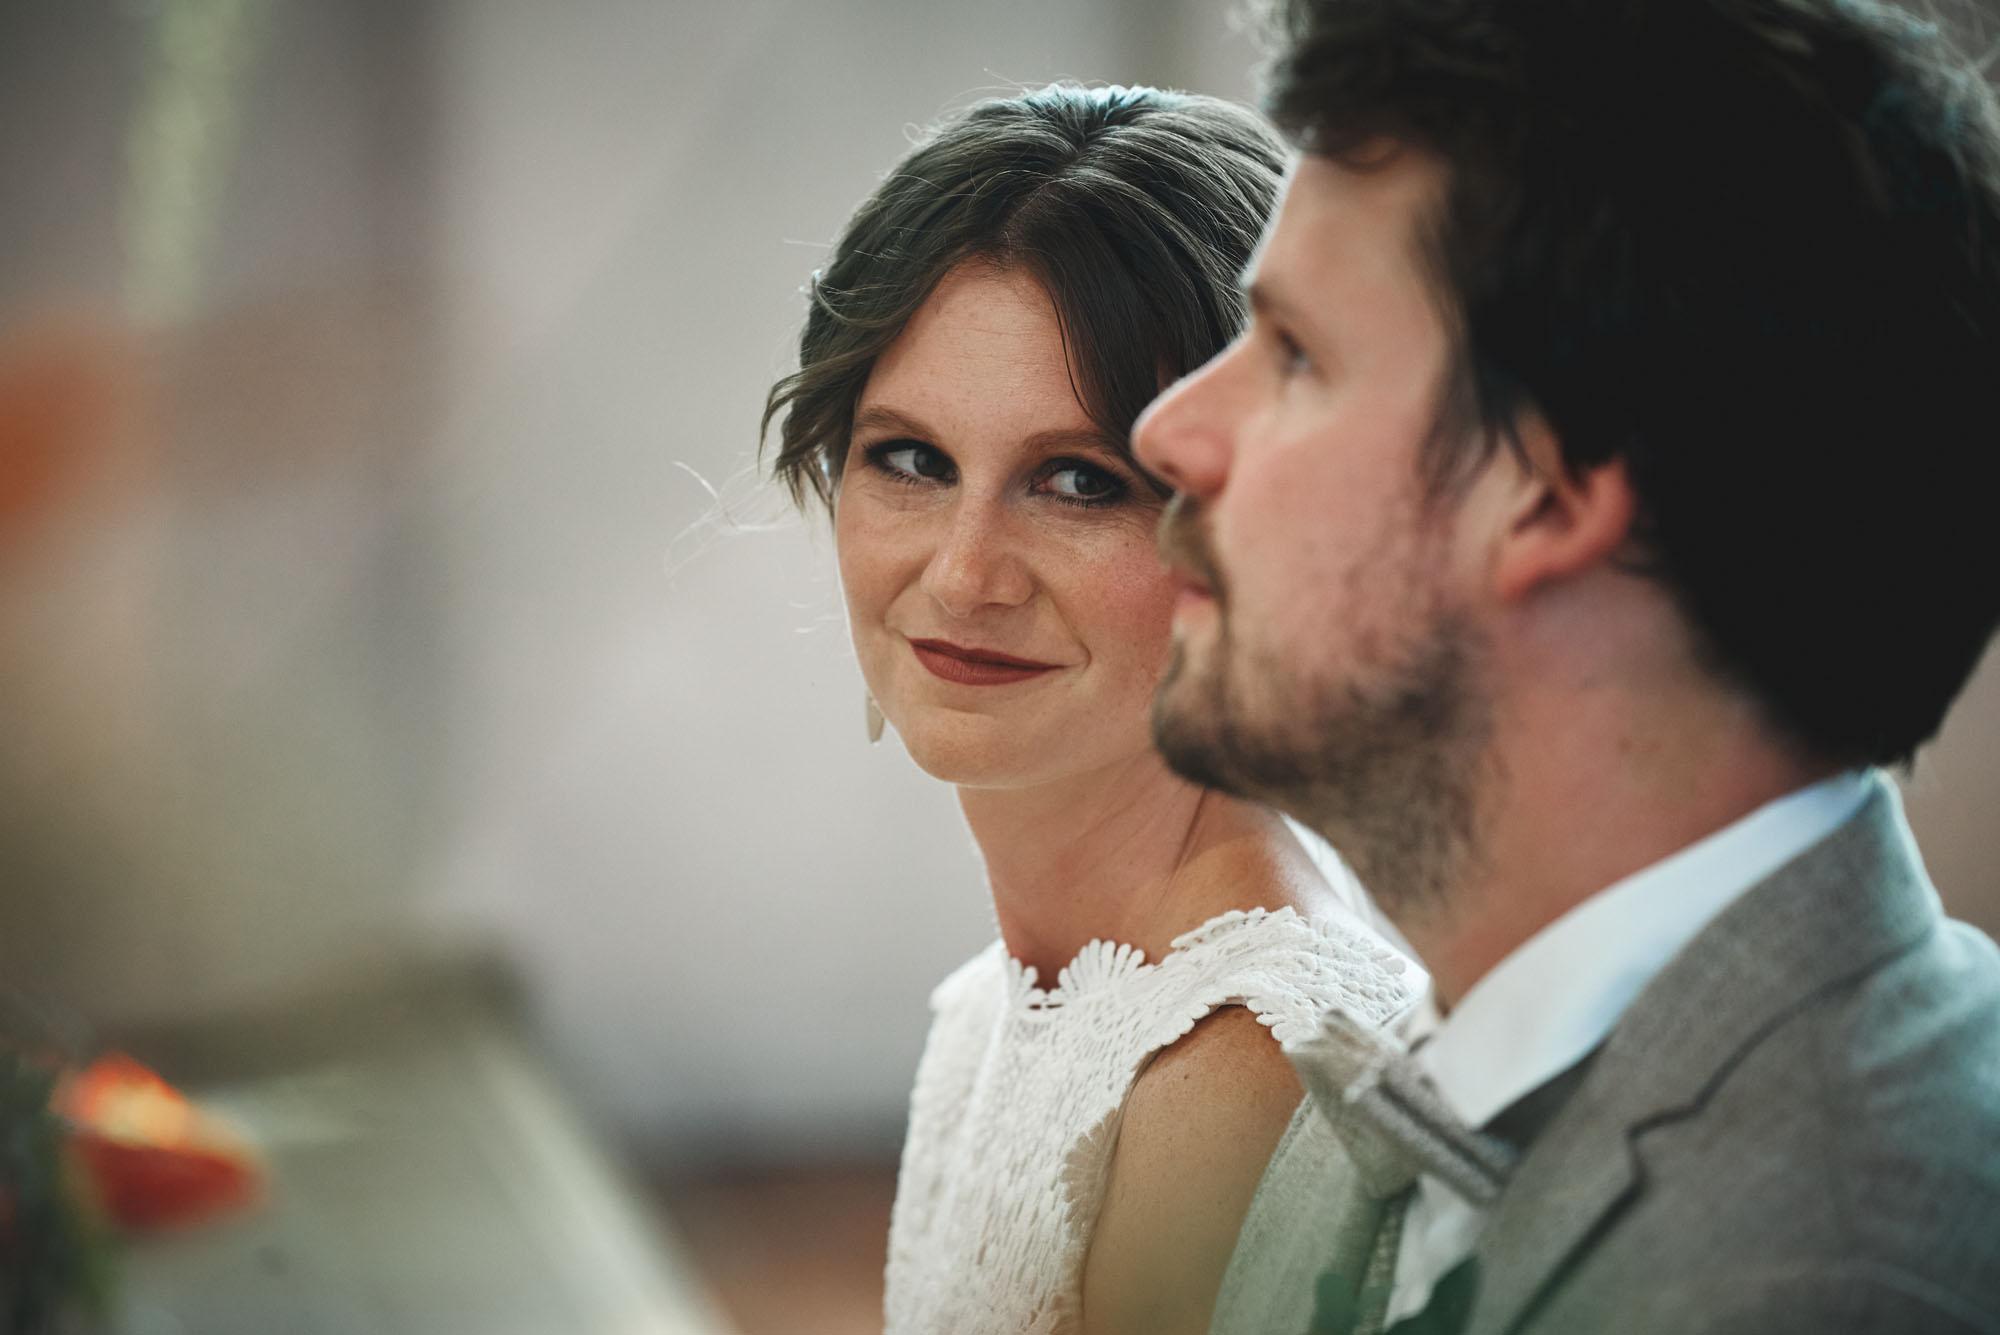 Martin Spoerl Potography Hochzeit Ailinger Muehle 0023